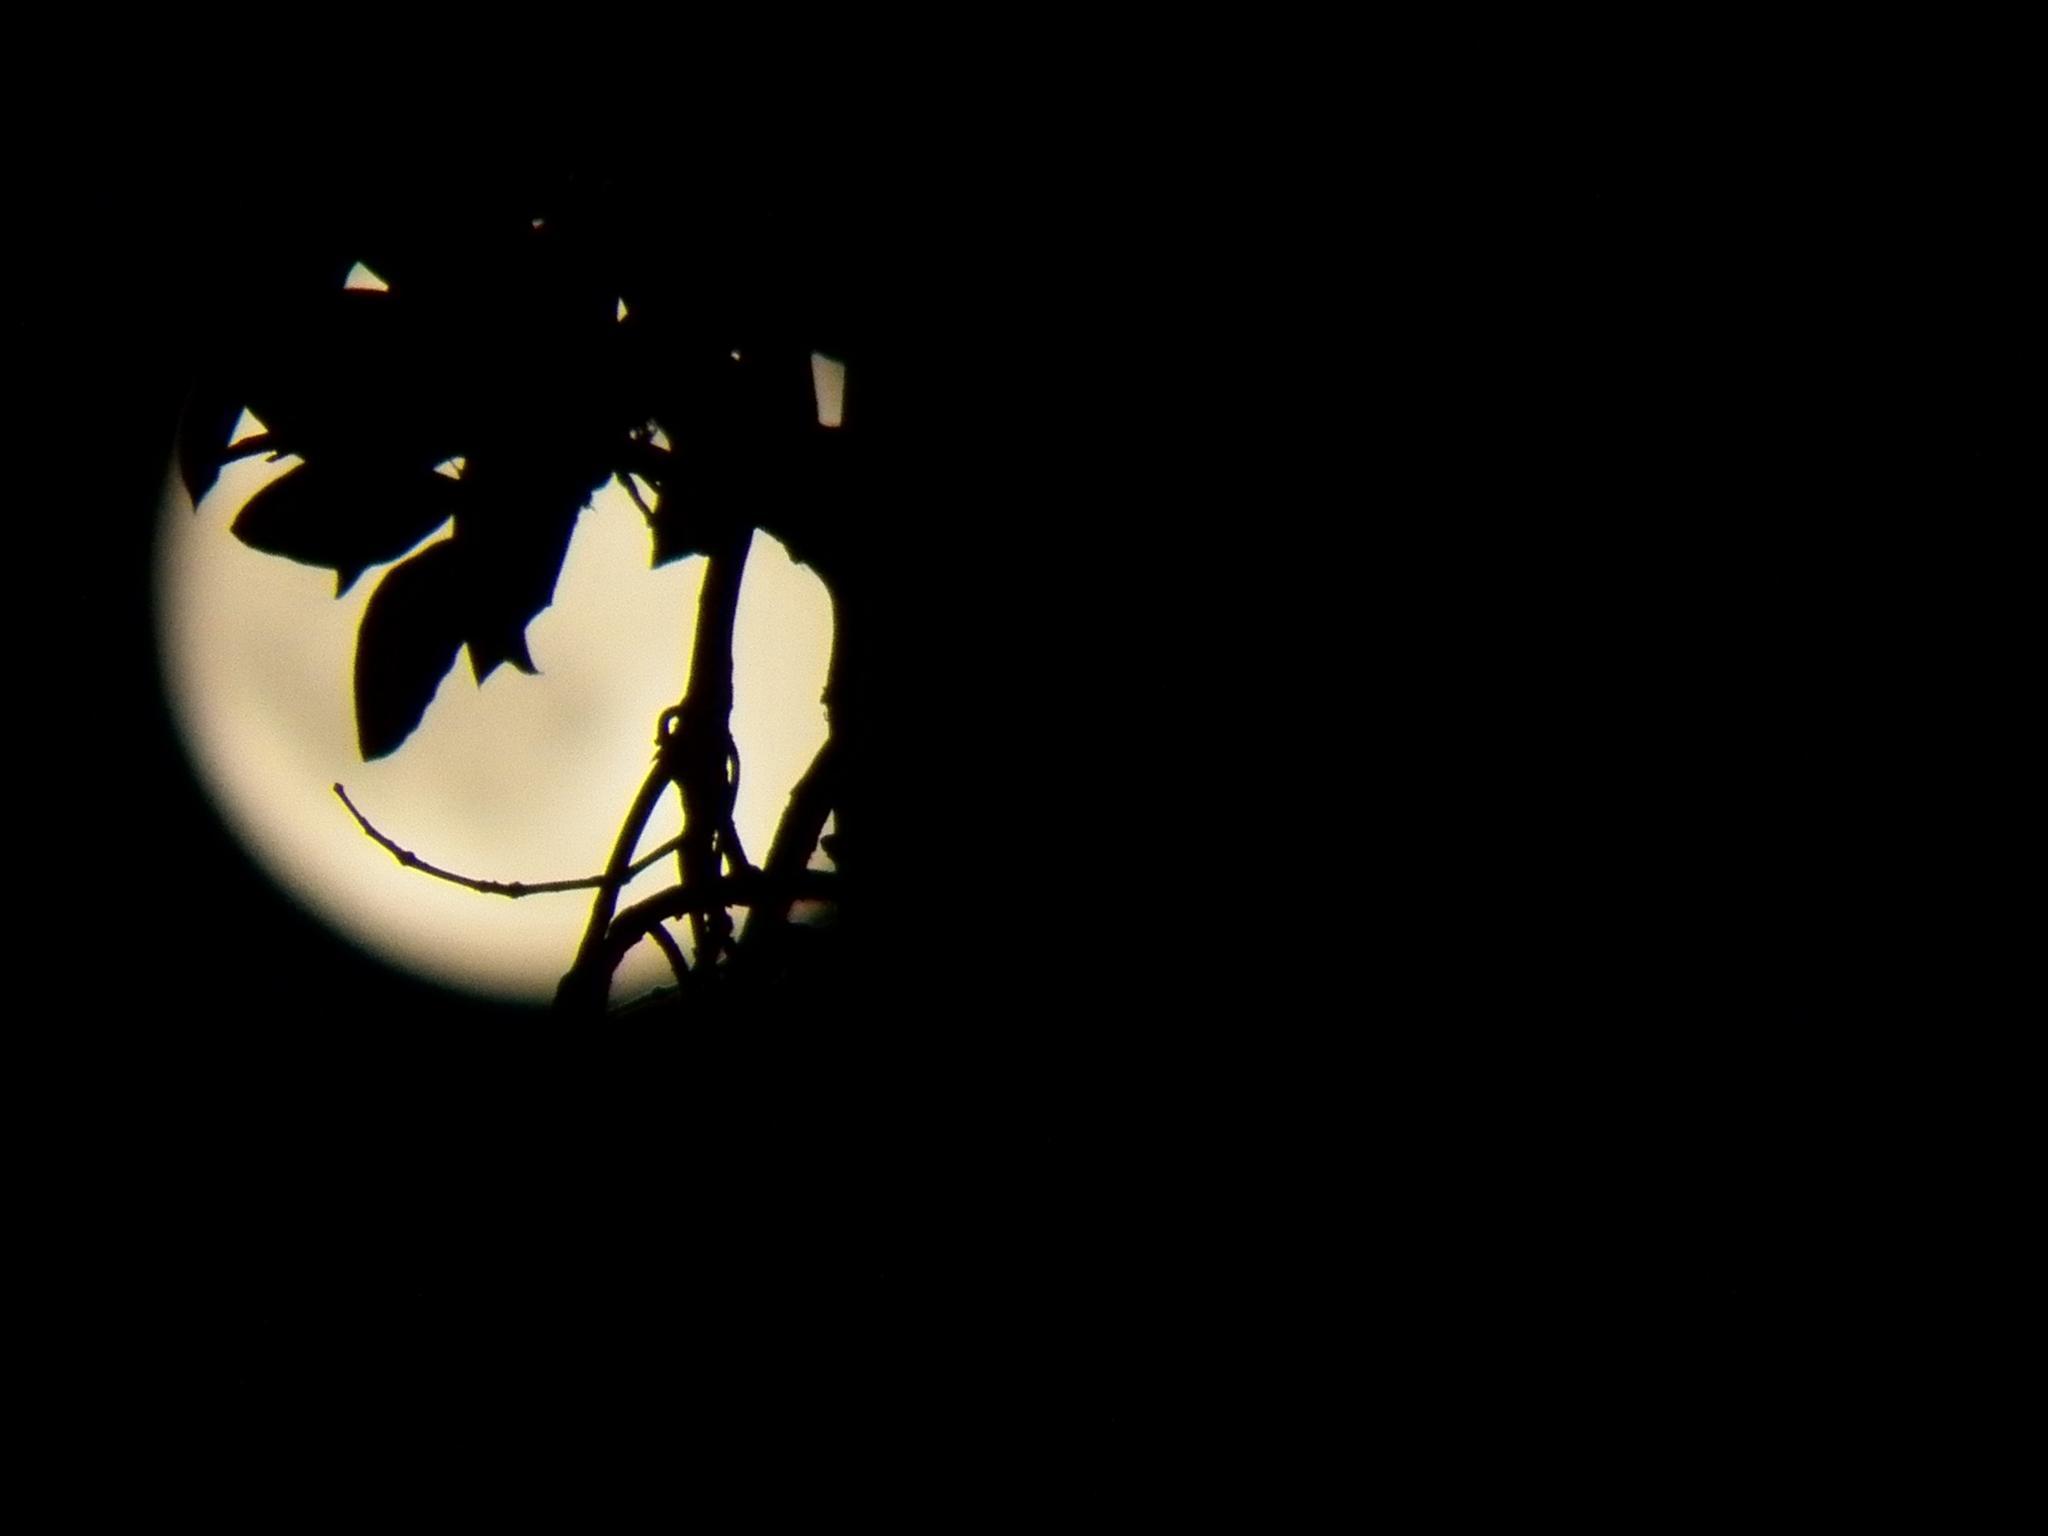 Lunar smiles by Tracie